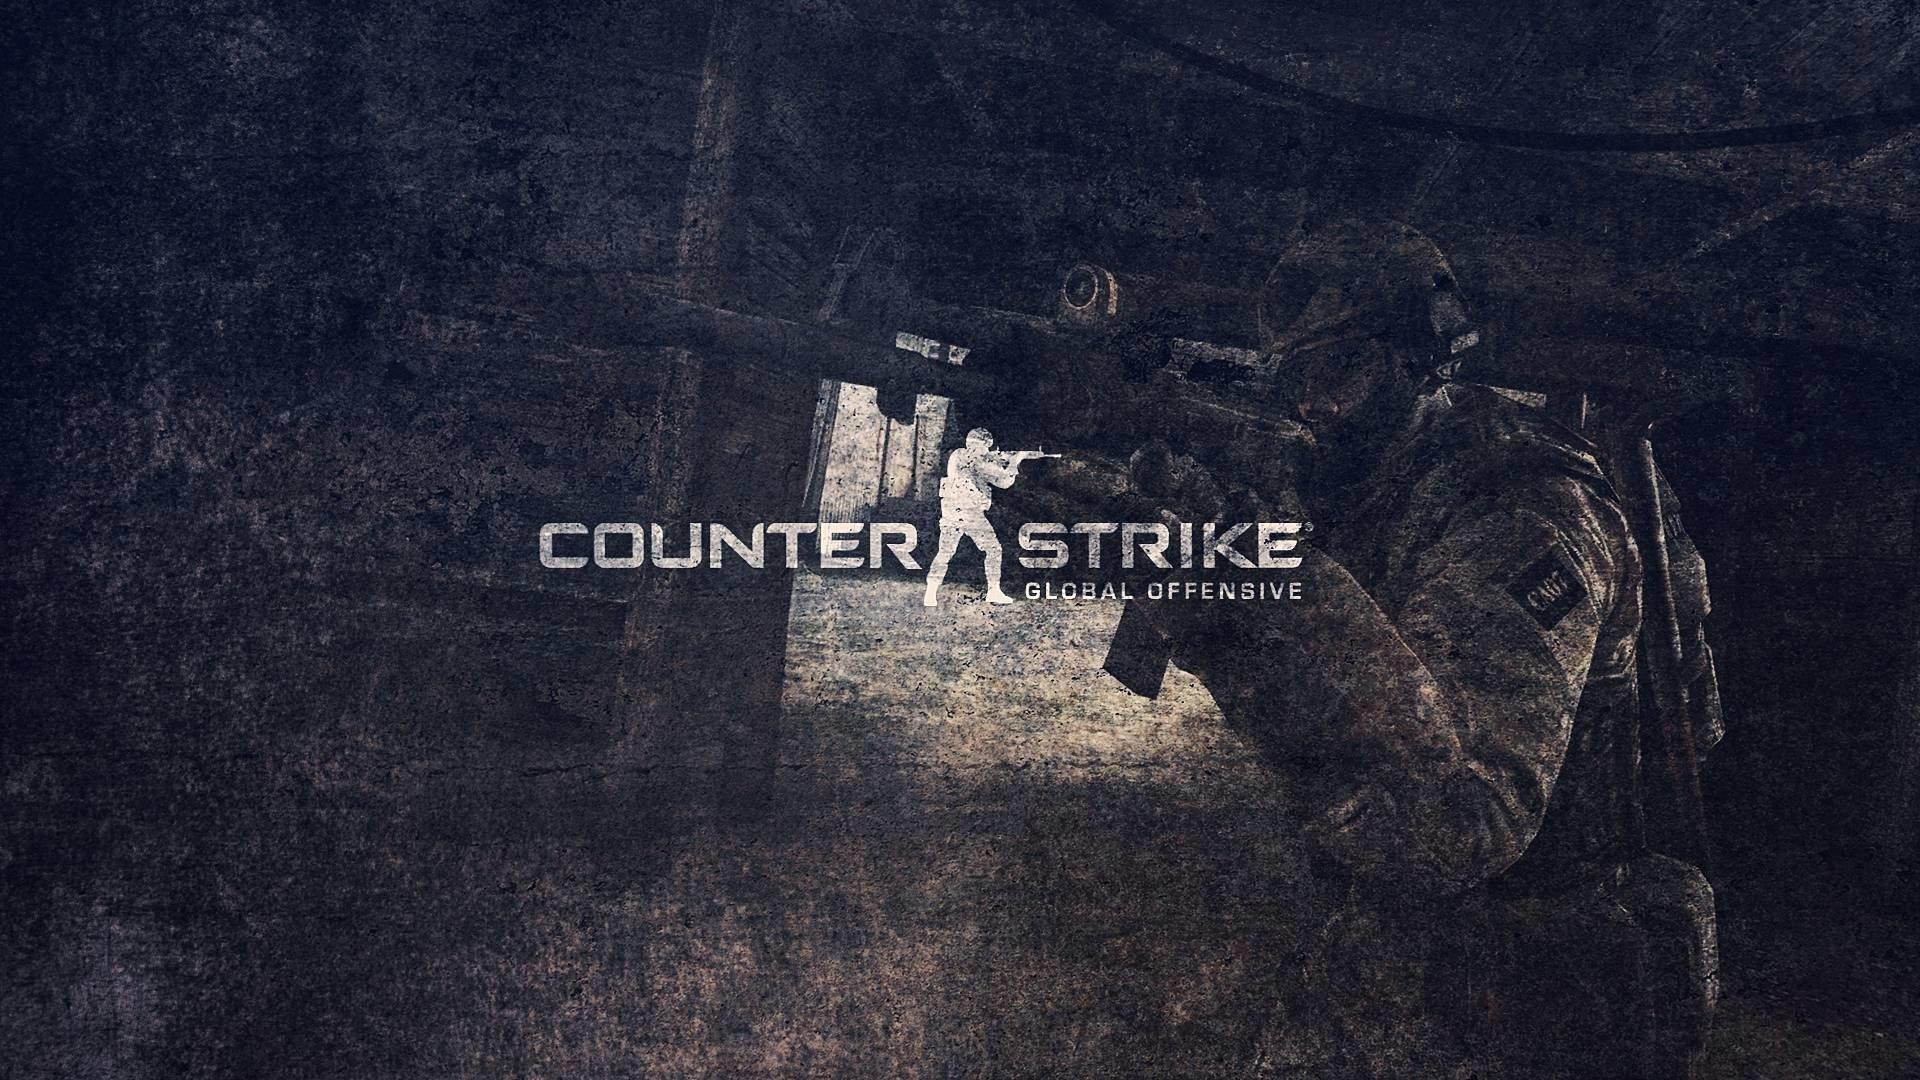 187 Counter Strike Global Offensive Fondos De Pantalla Hd